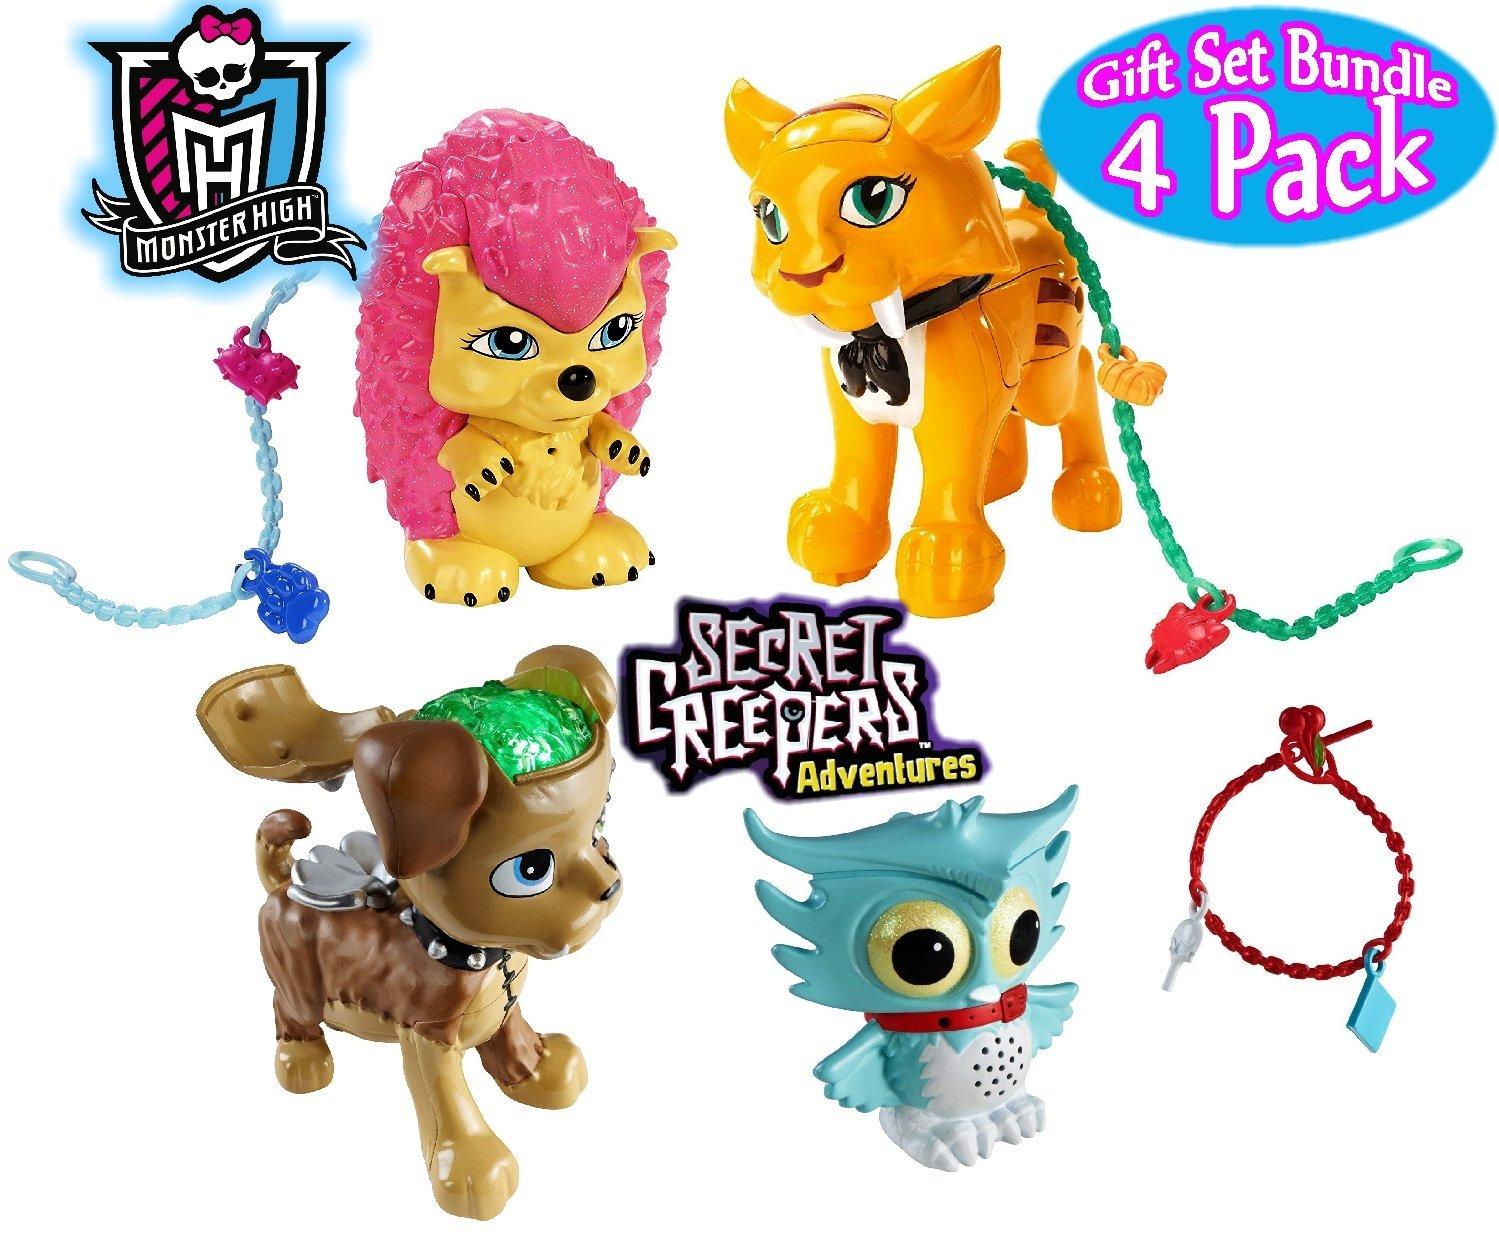 Buy Monster High Secret Creepers Pets Sweet Fang Cushion